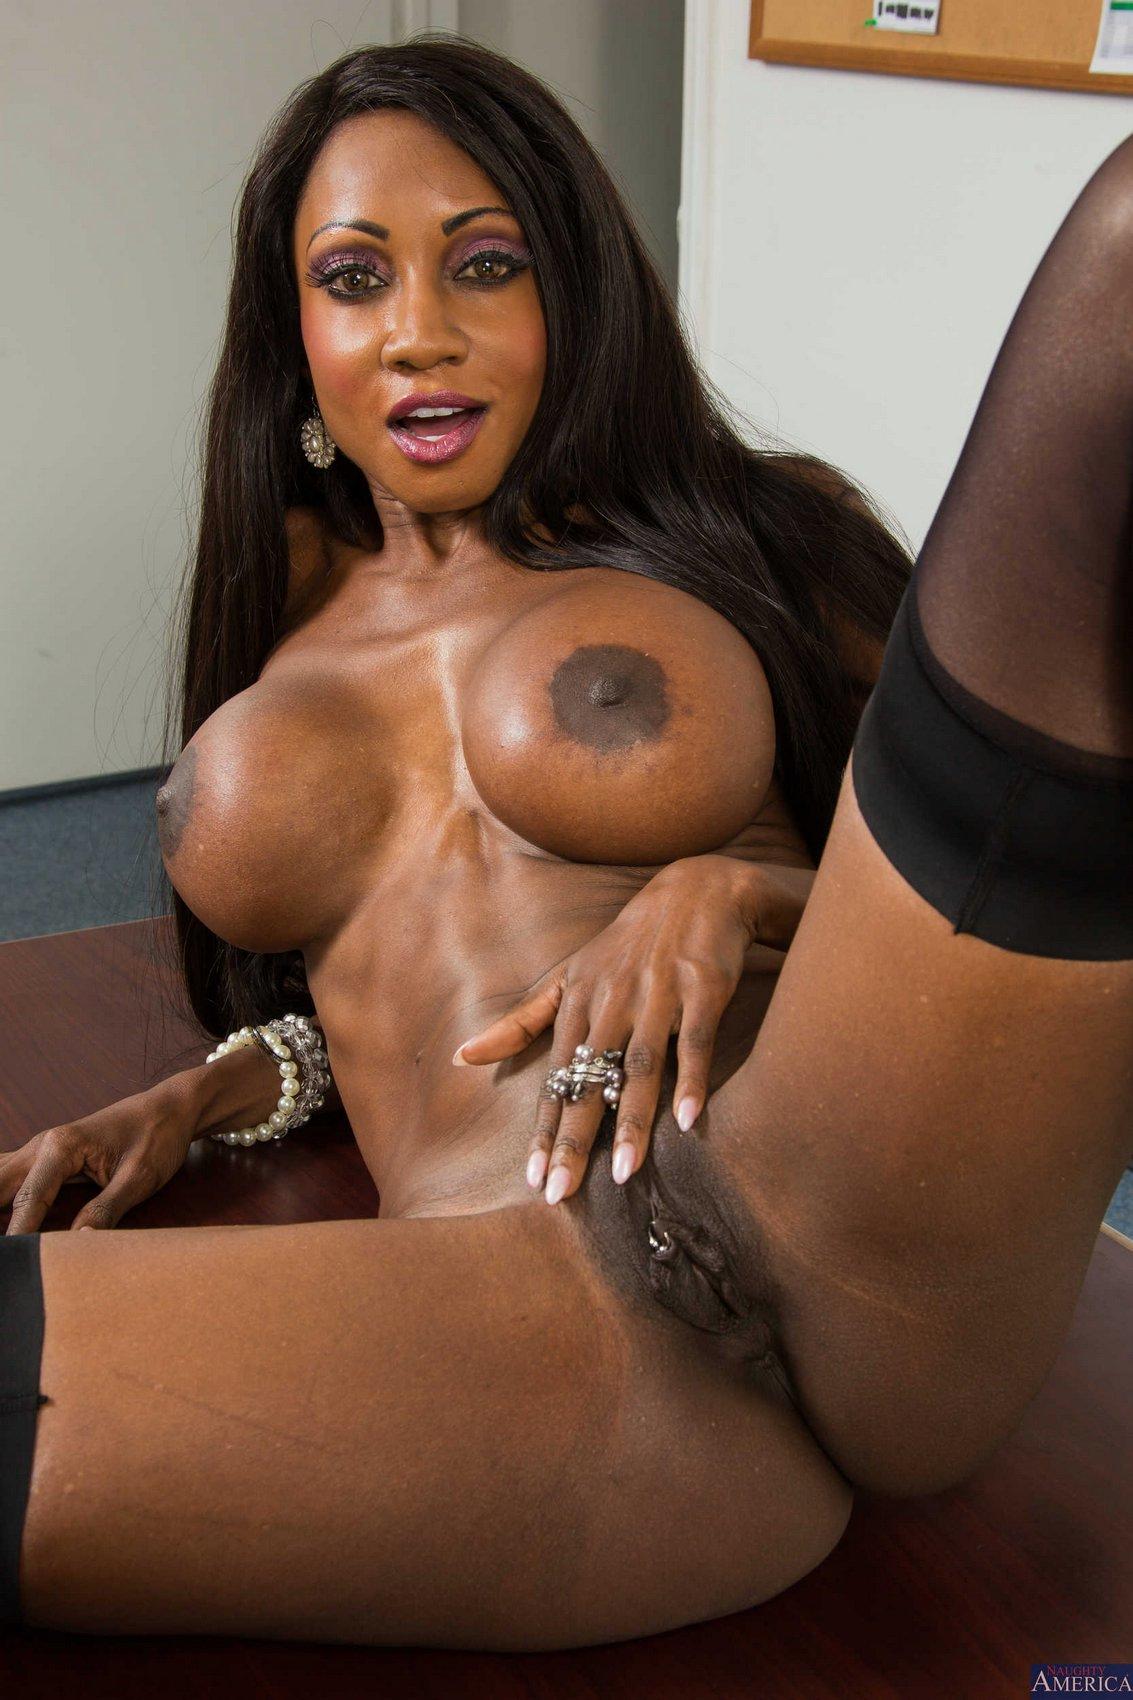 Brazzers hot ebony patient leilani leeane fucks her doctor 5